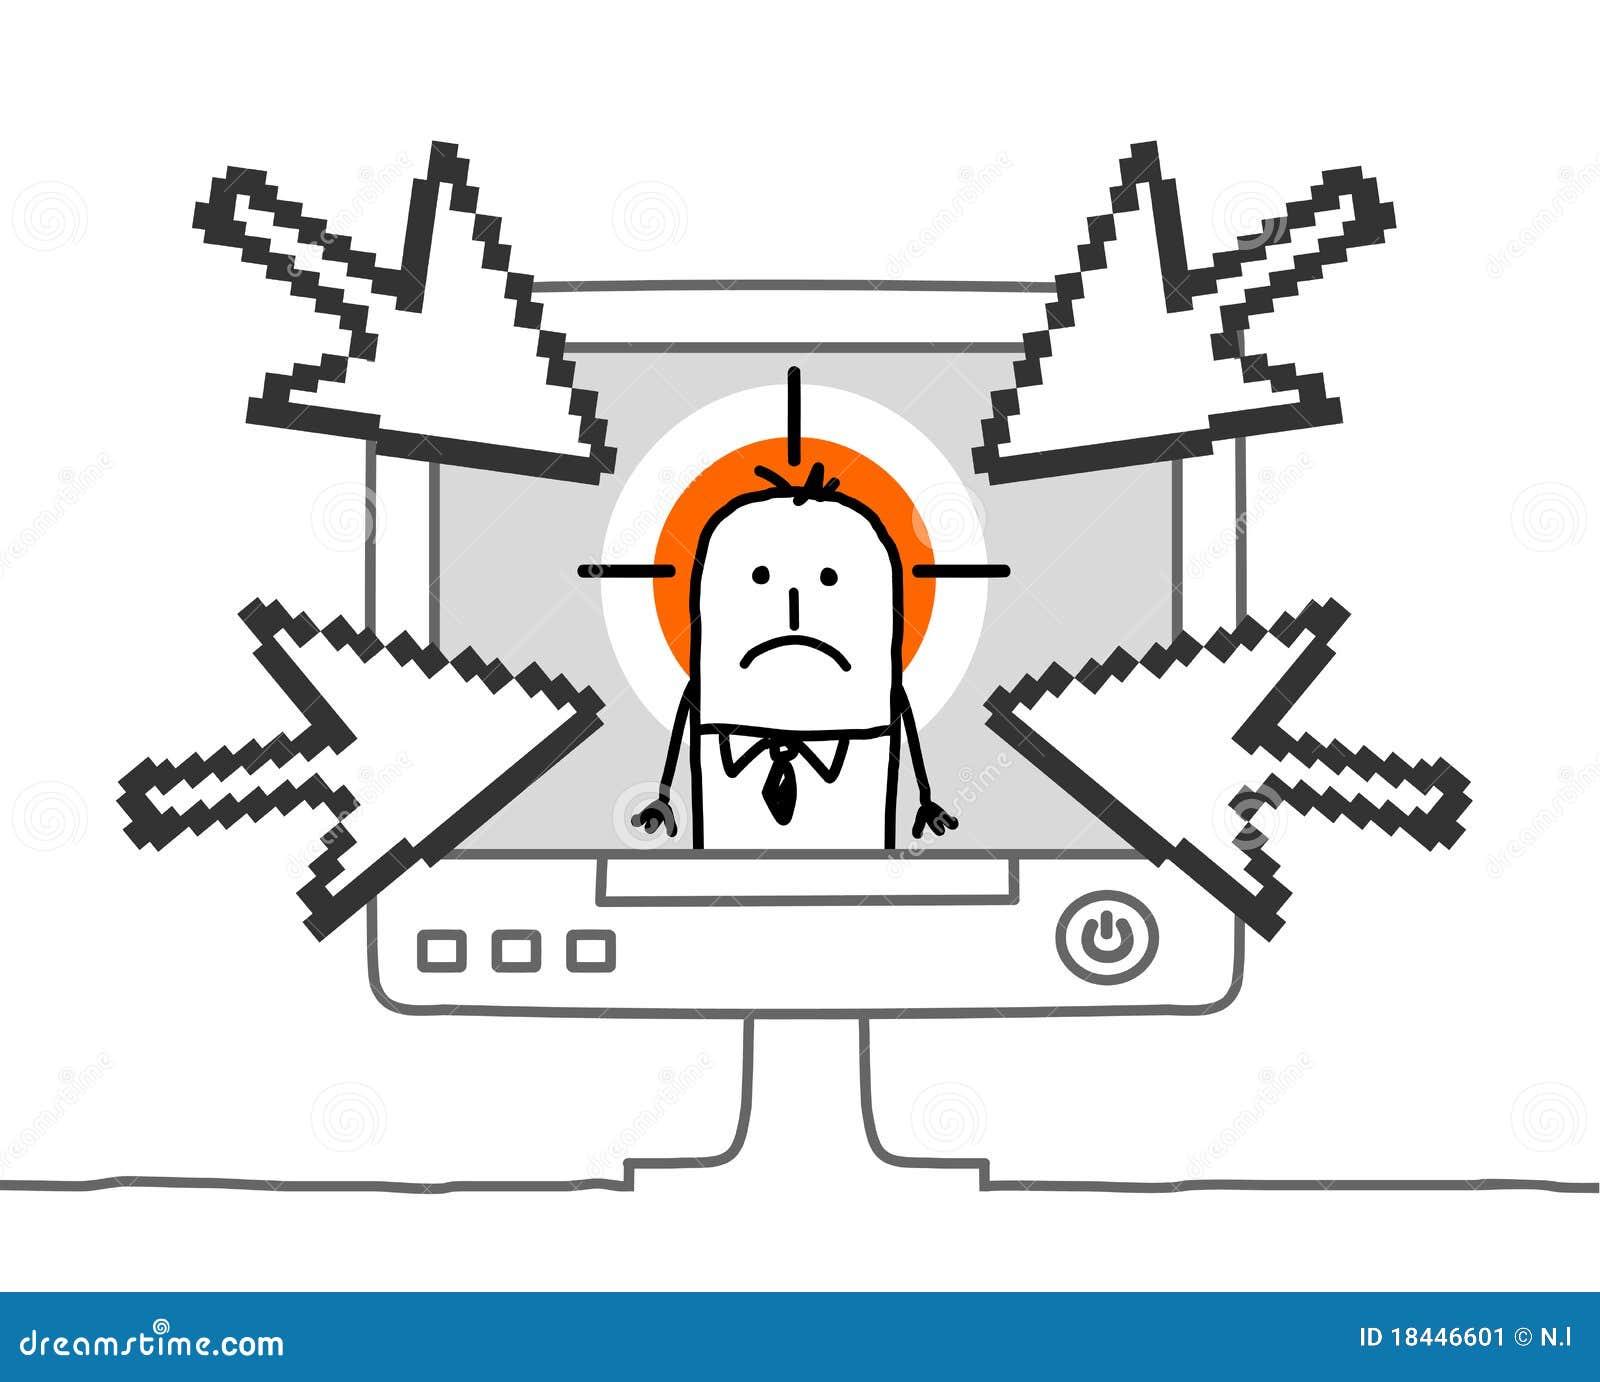 Businessman Amp Cyberbullying Stock Image Image 18446601